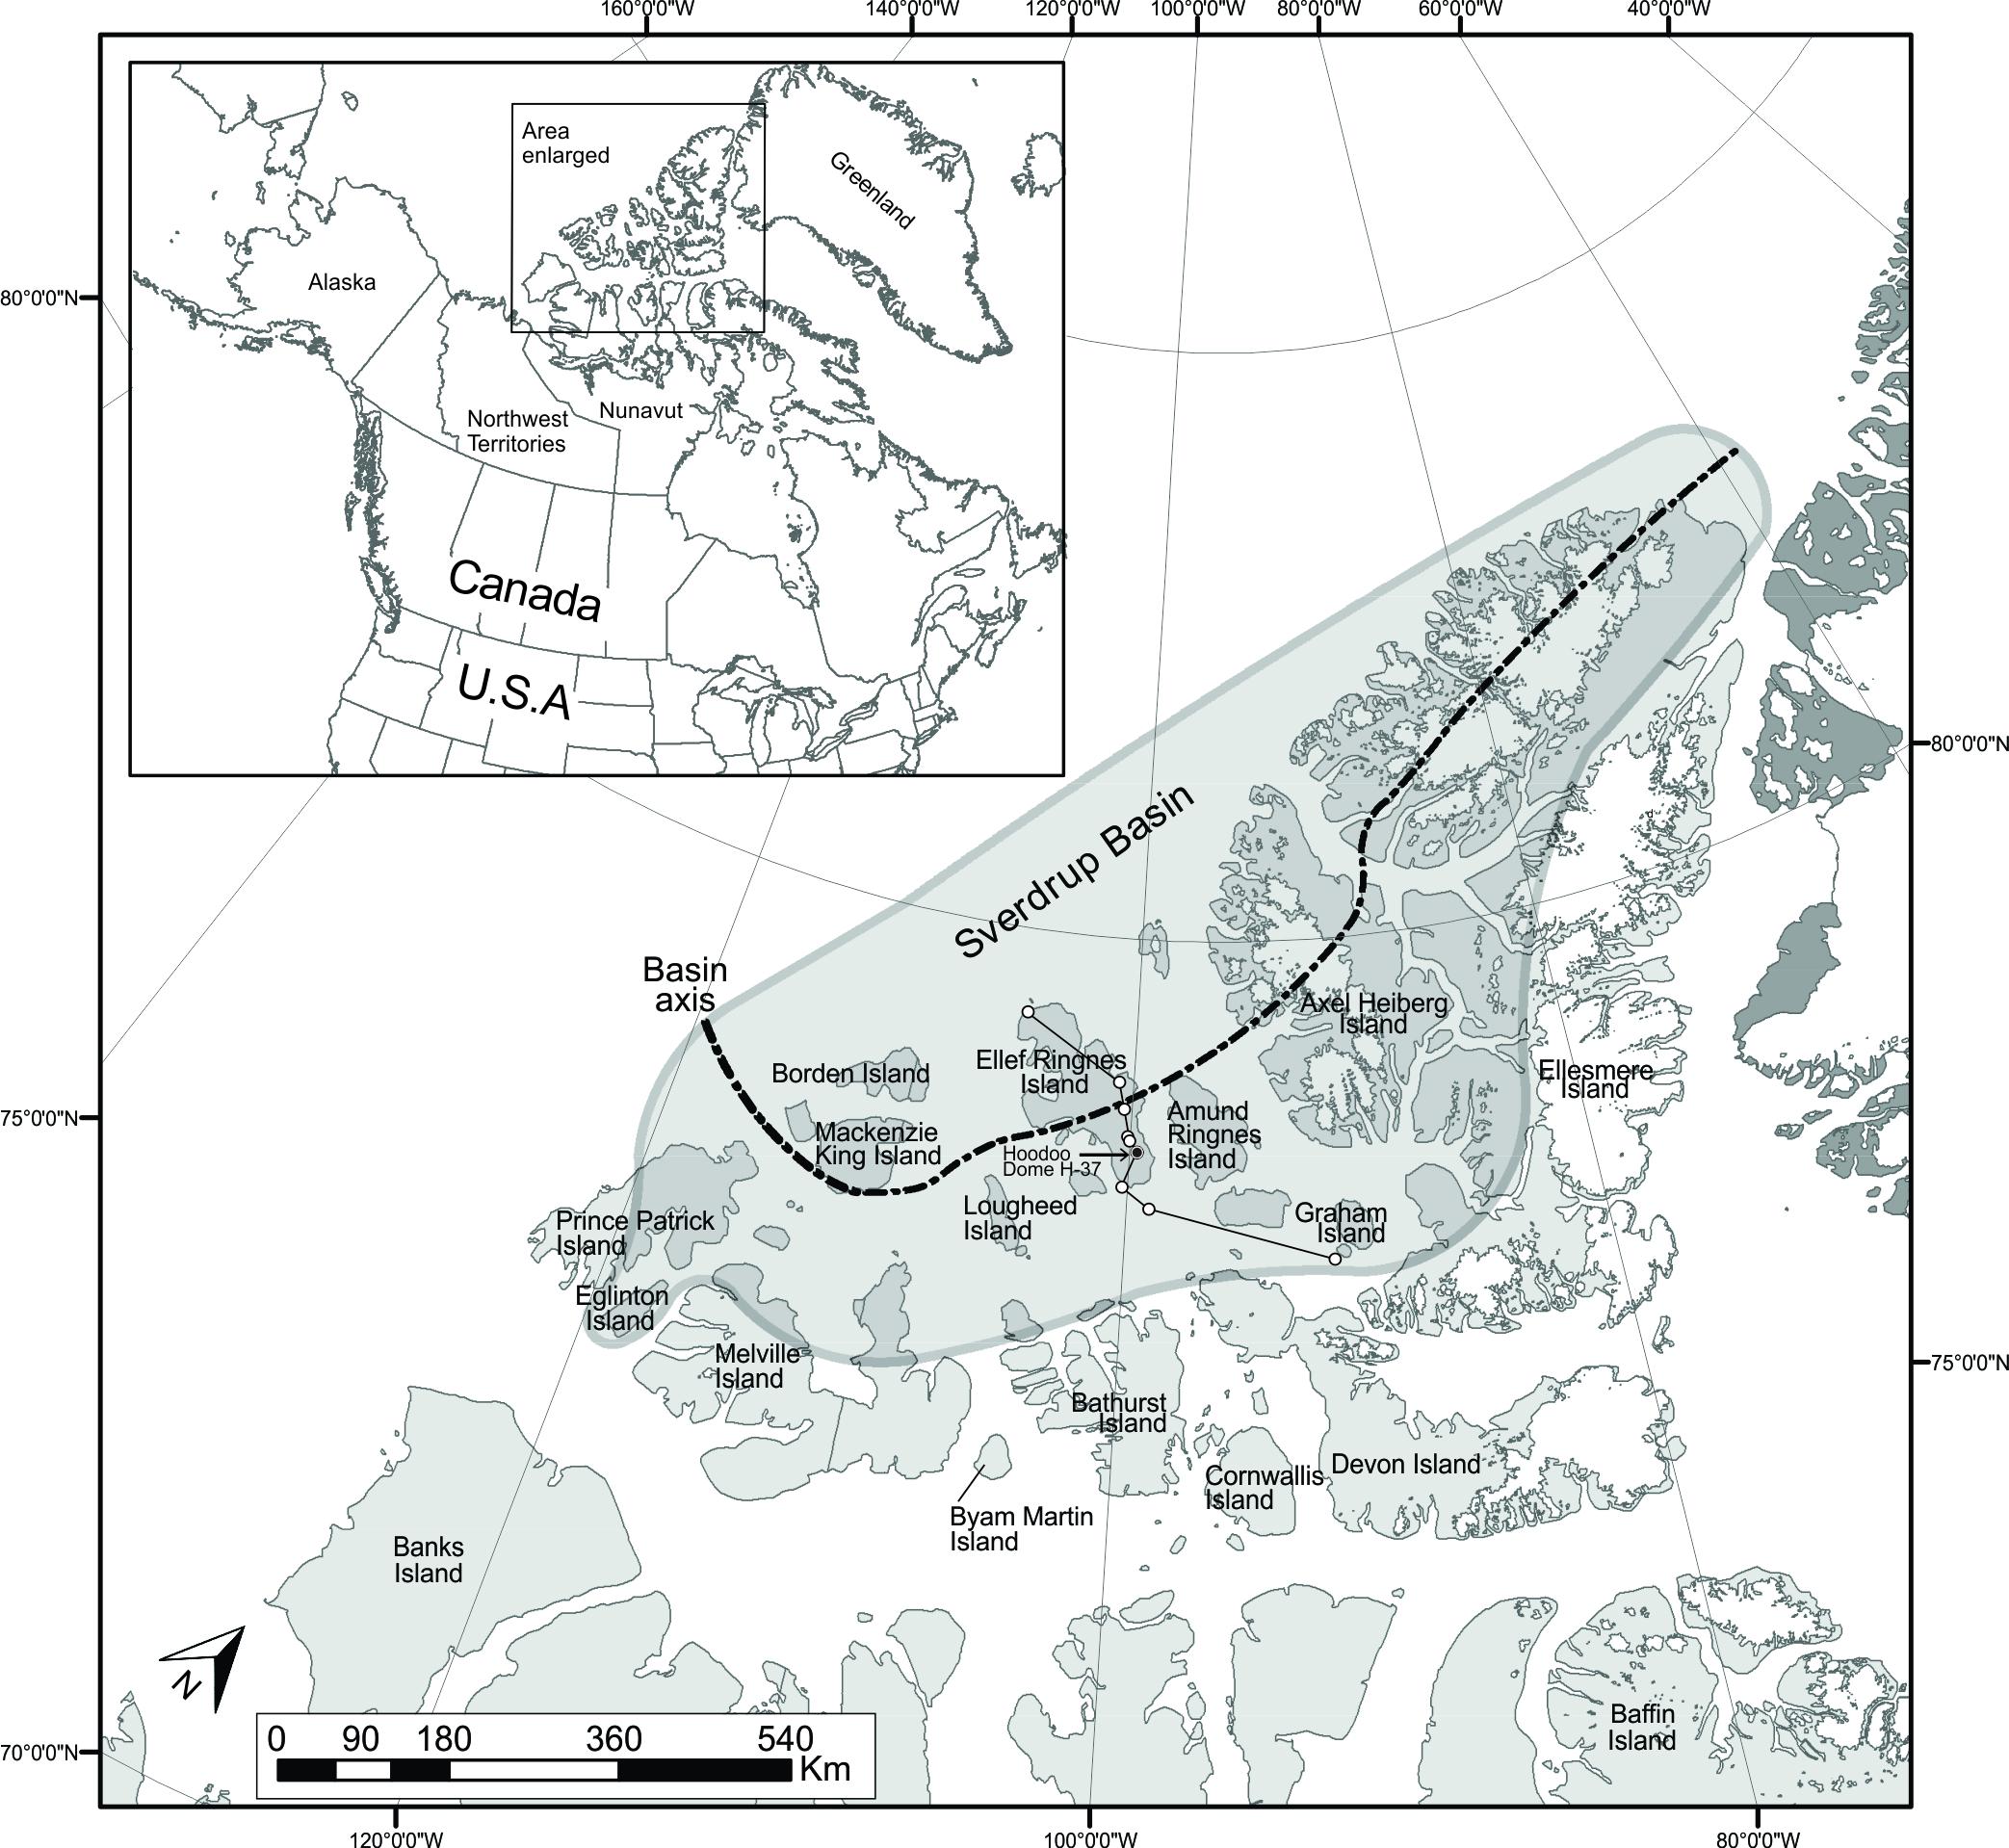 Sverdrup Basin